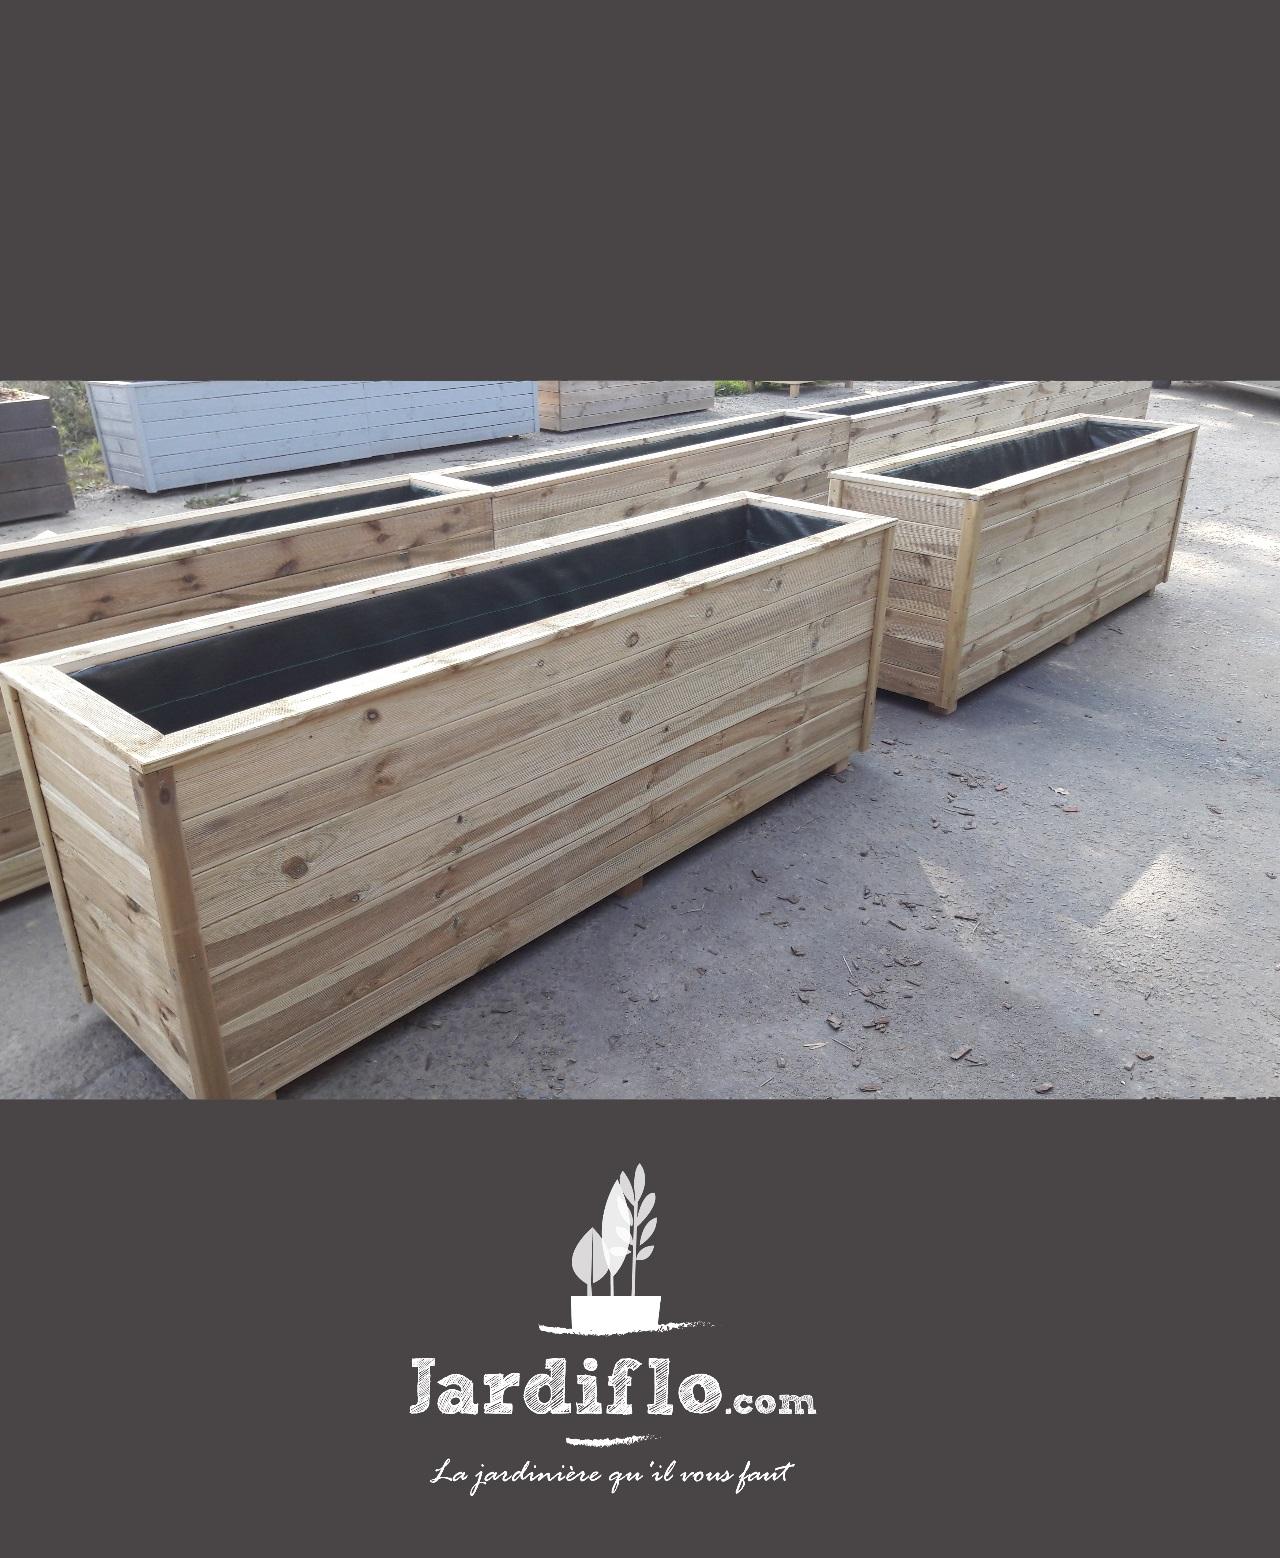 Jardini re rectangulaire en bois 200x50x60 360l compact xxl jardiflo - Jardiniere xxl ...